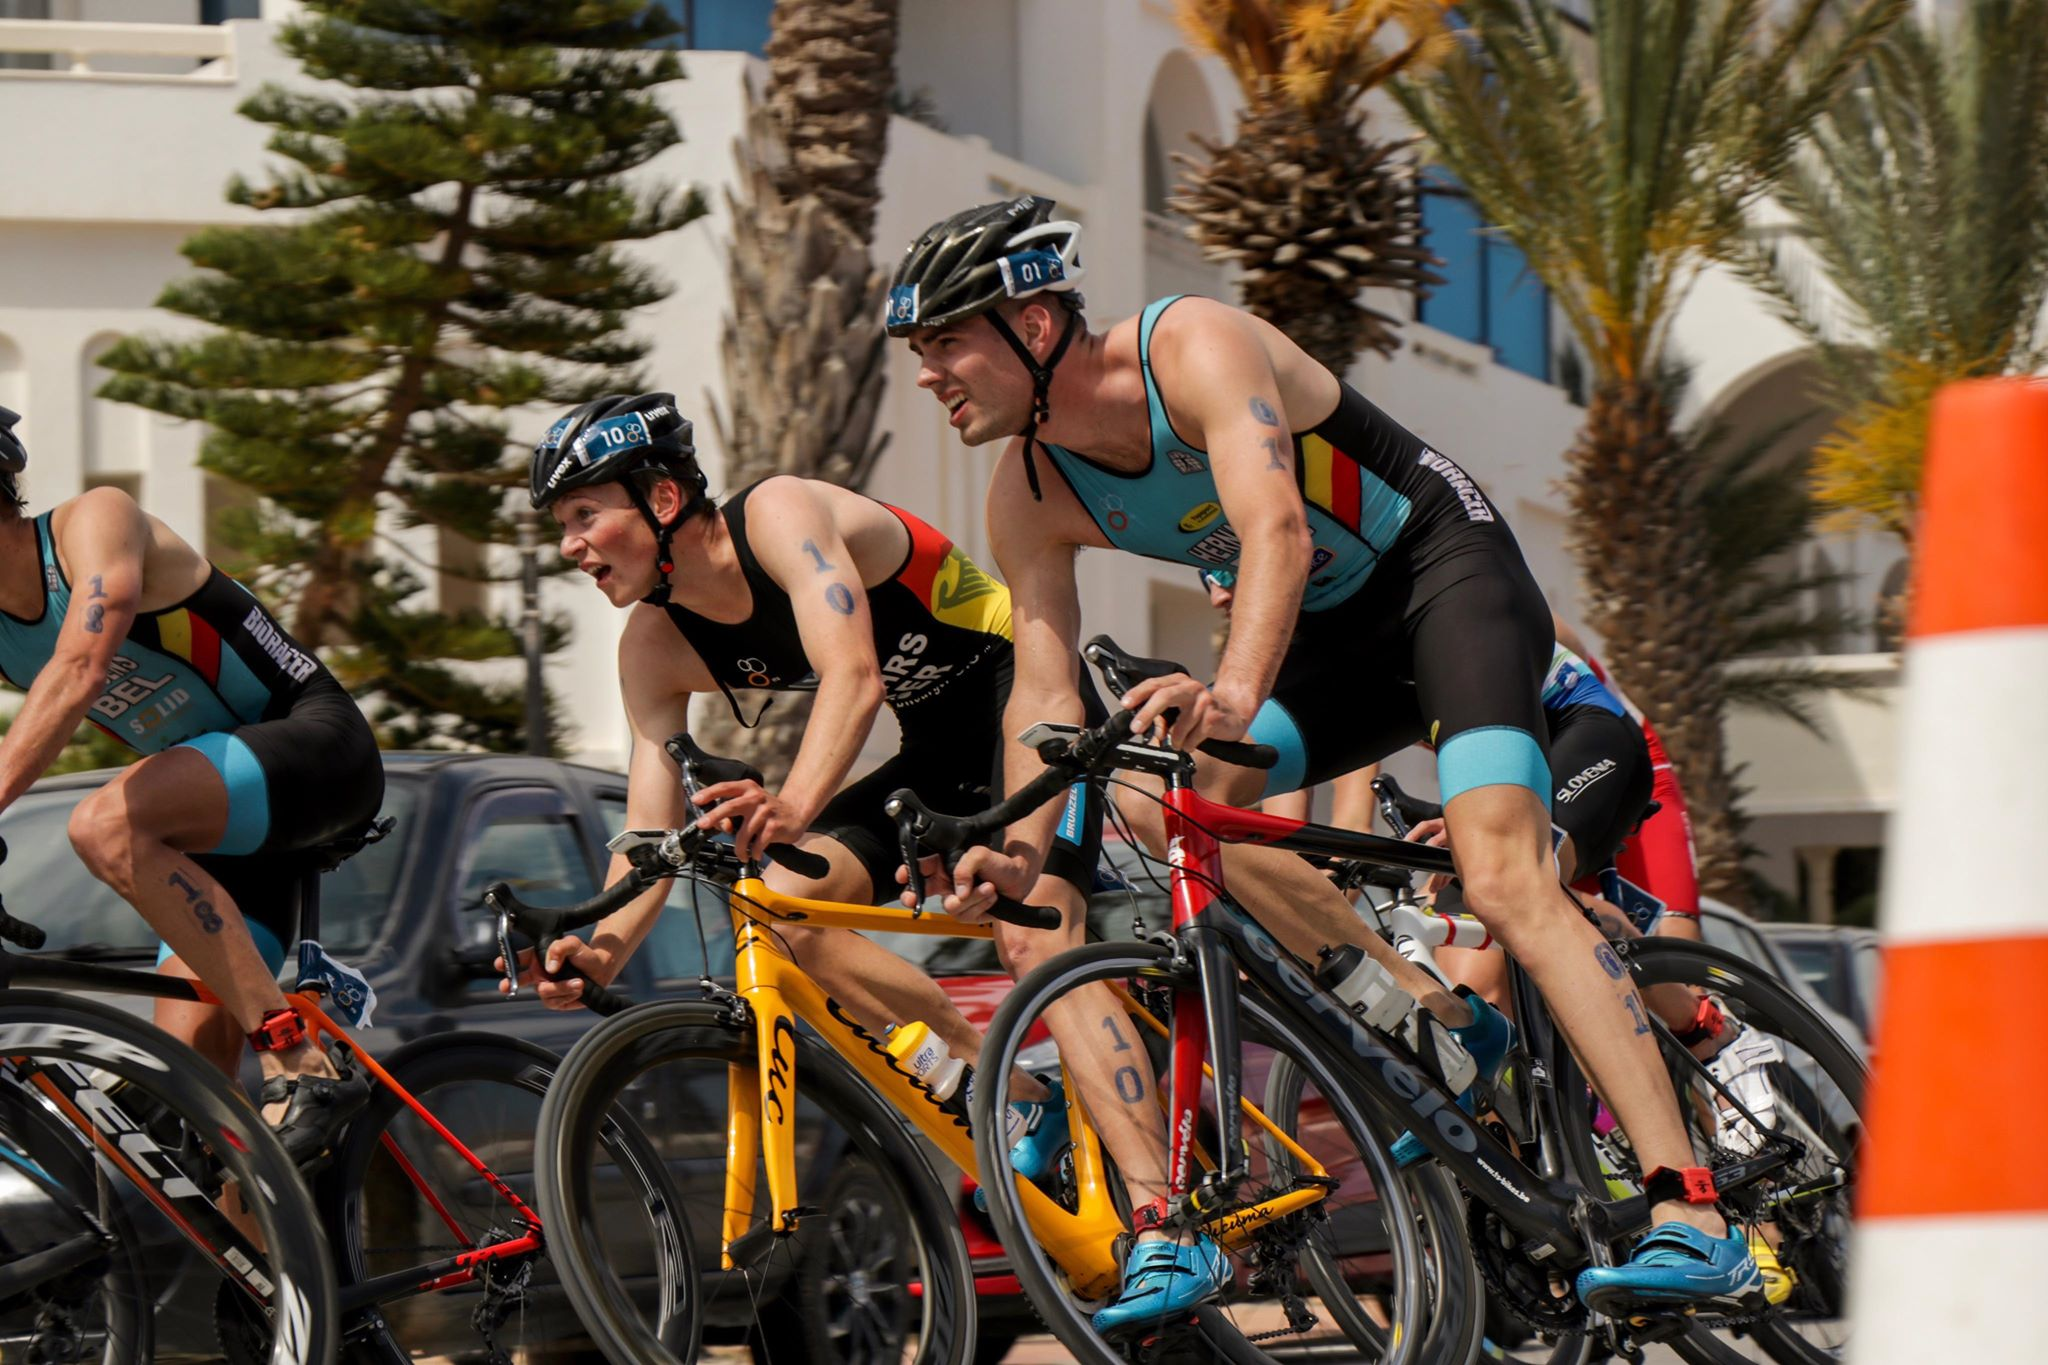 Hernaert en Jurgens samen in de kopgroep in Tunesie (foto: Emilio Hernaert)